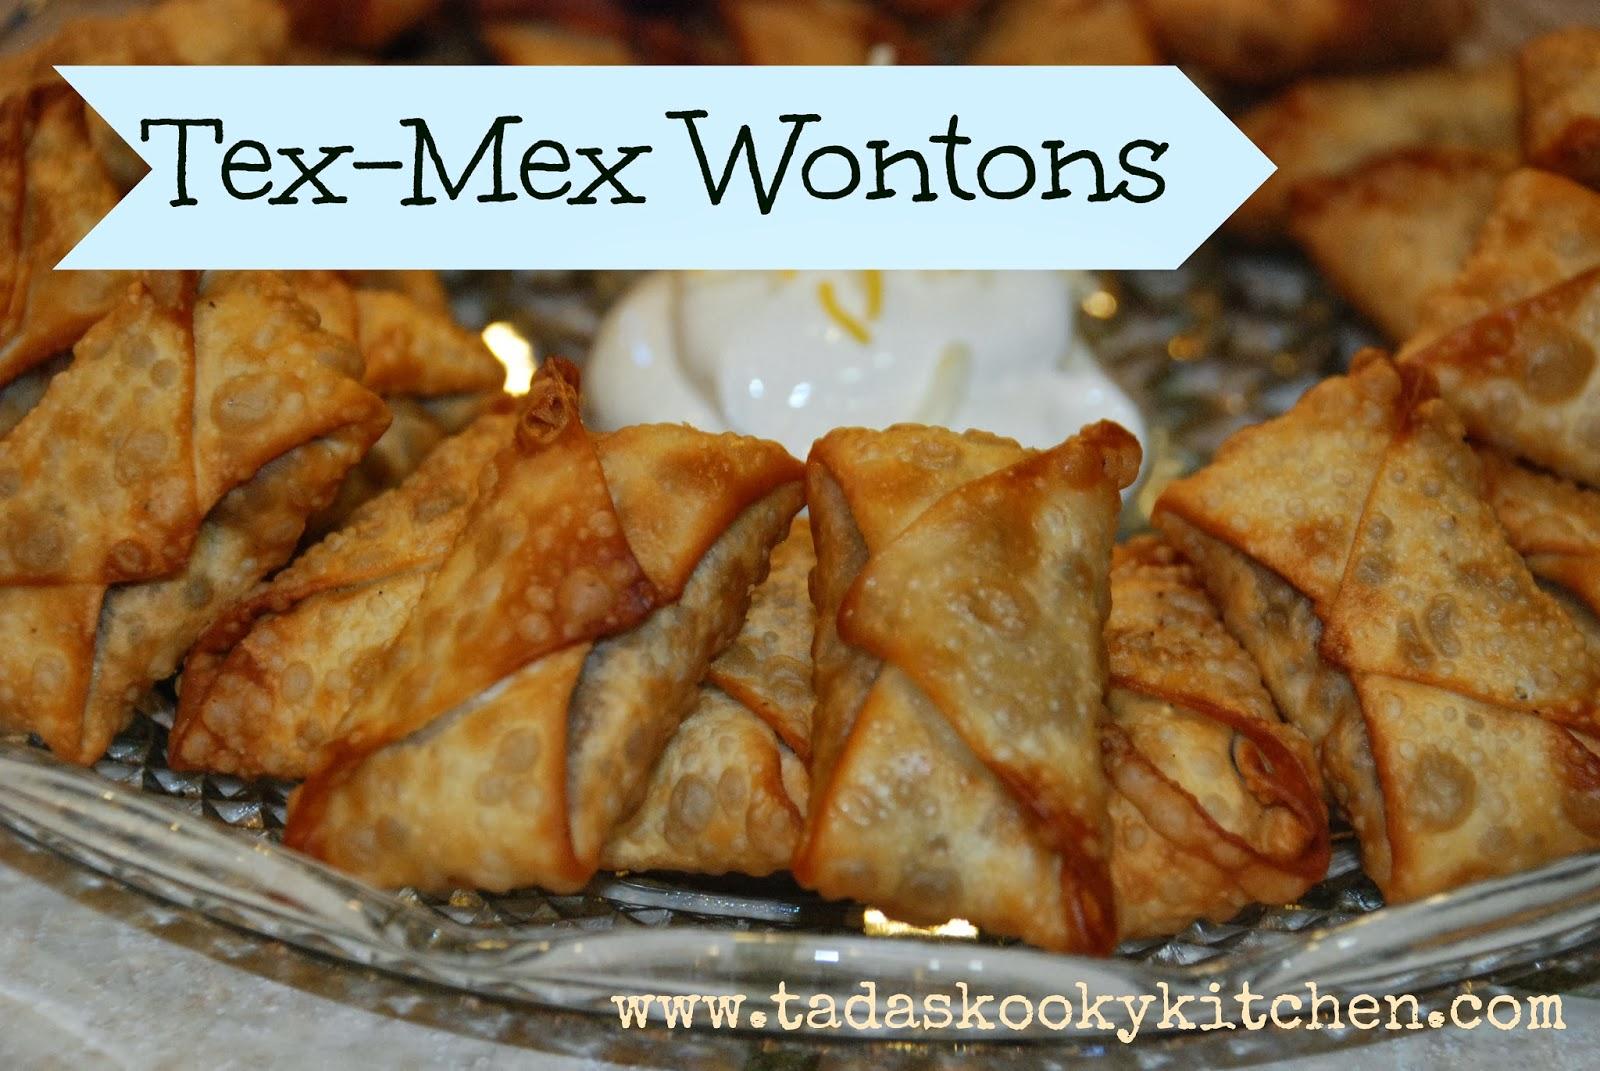 Tex-Mex Wontons